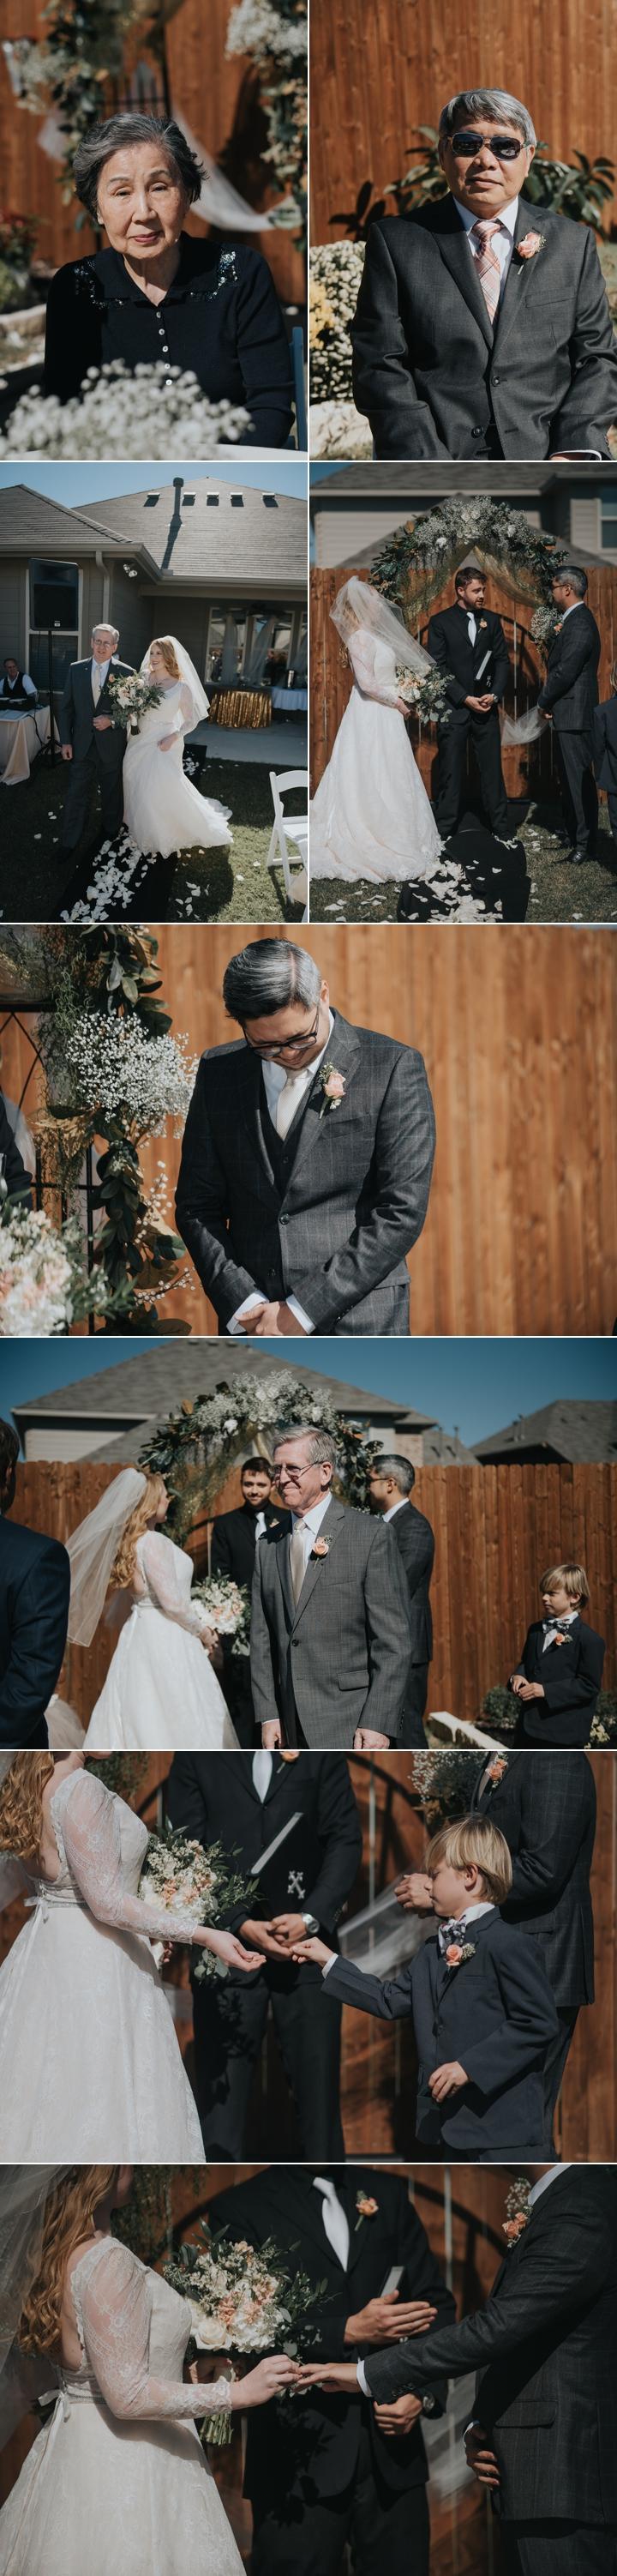 dallas-wedding-photographers-vb 7.jpg